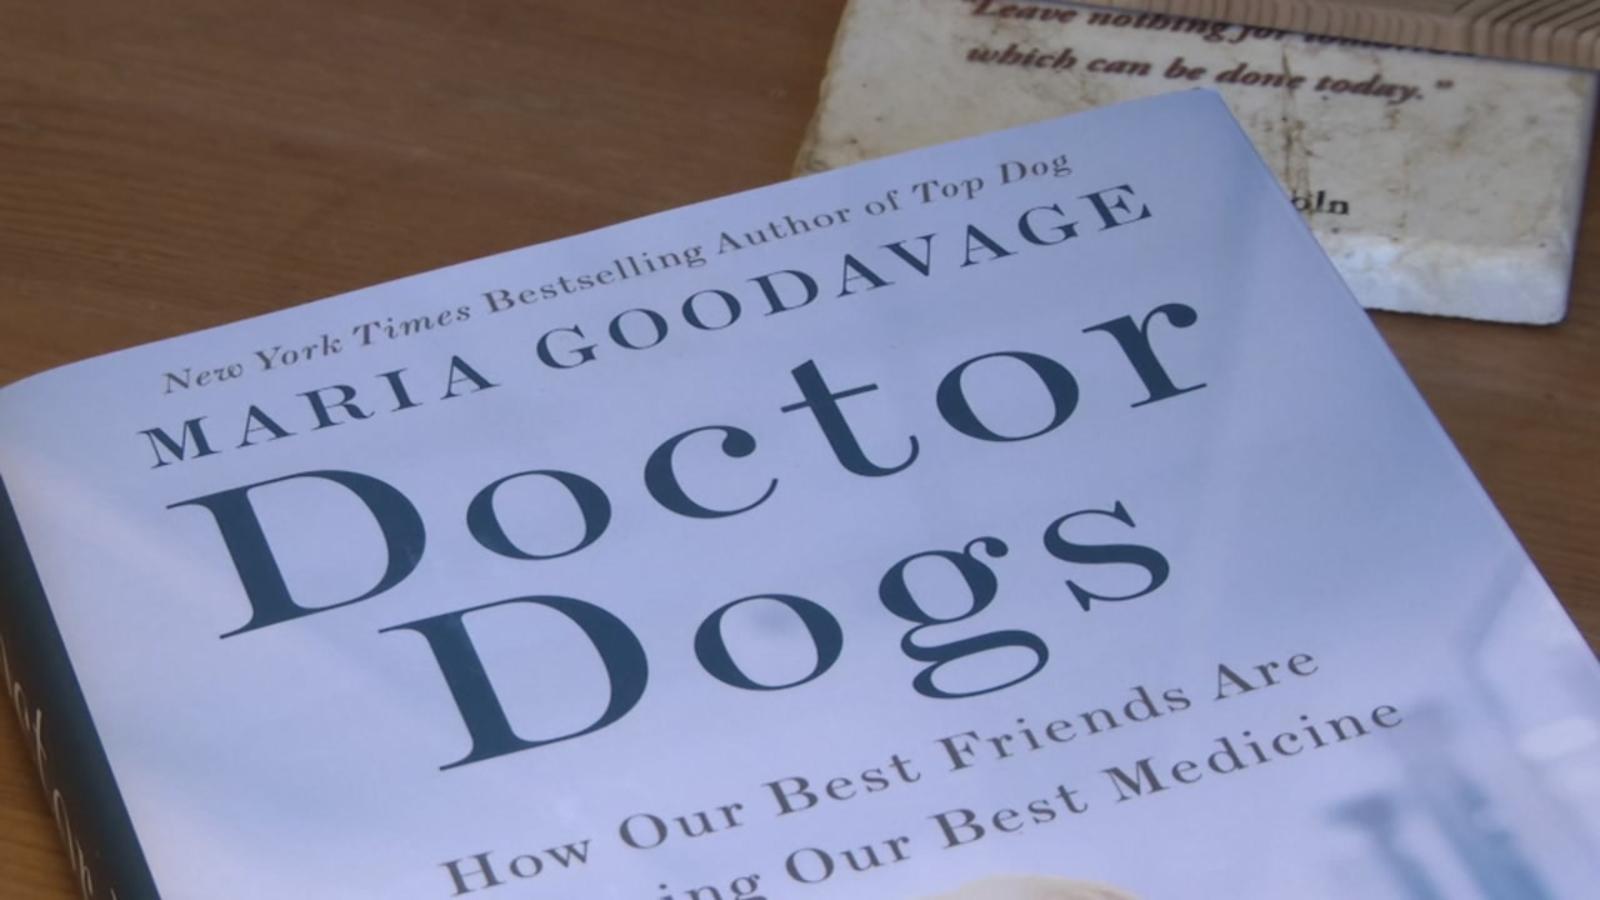 'Doctor Dogs': Book celebrates dogs in medicine